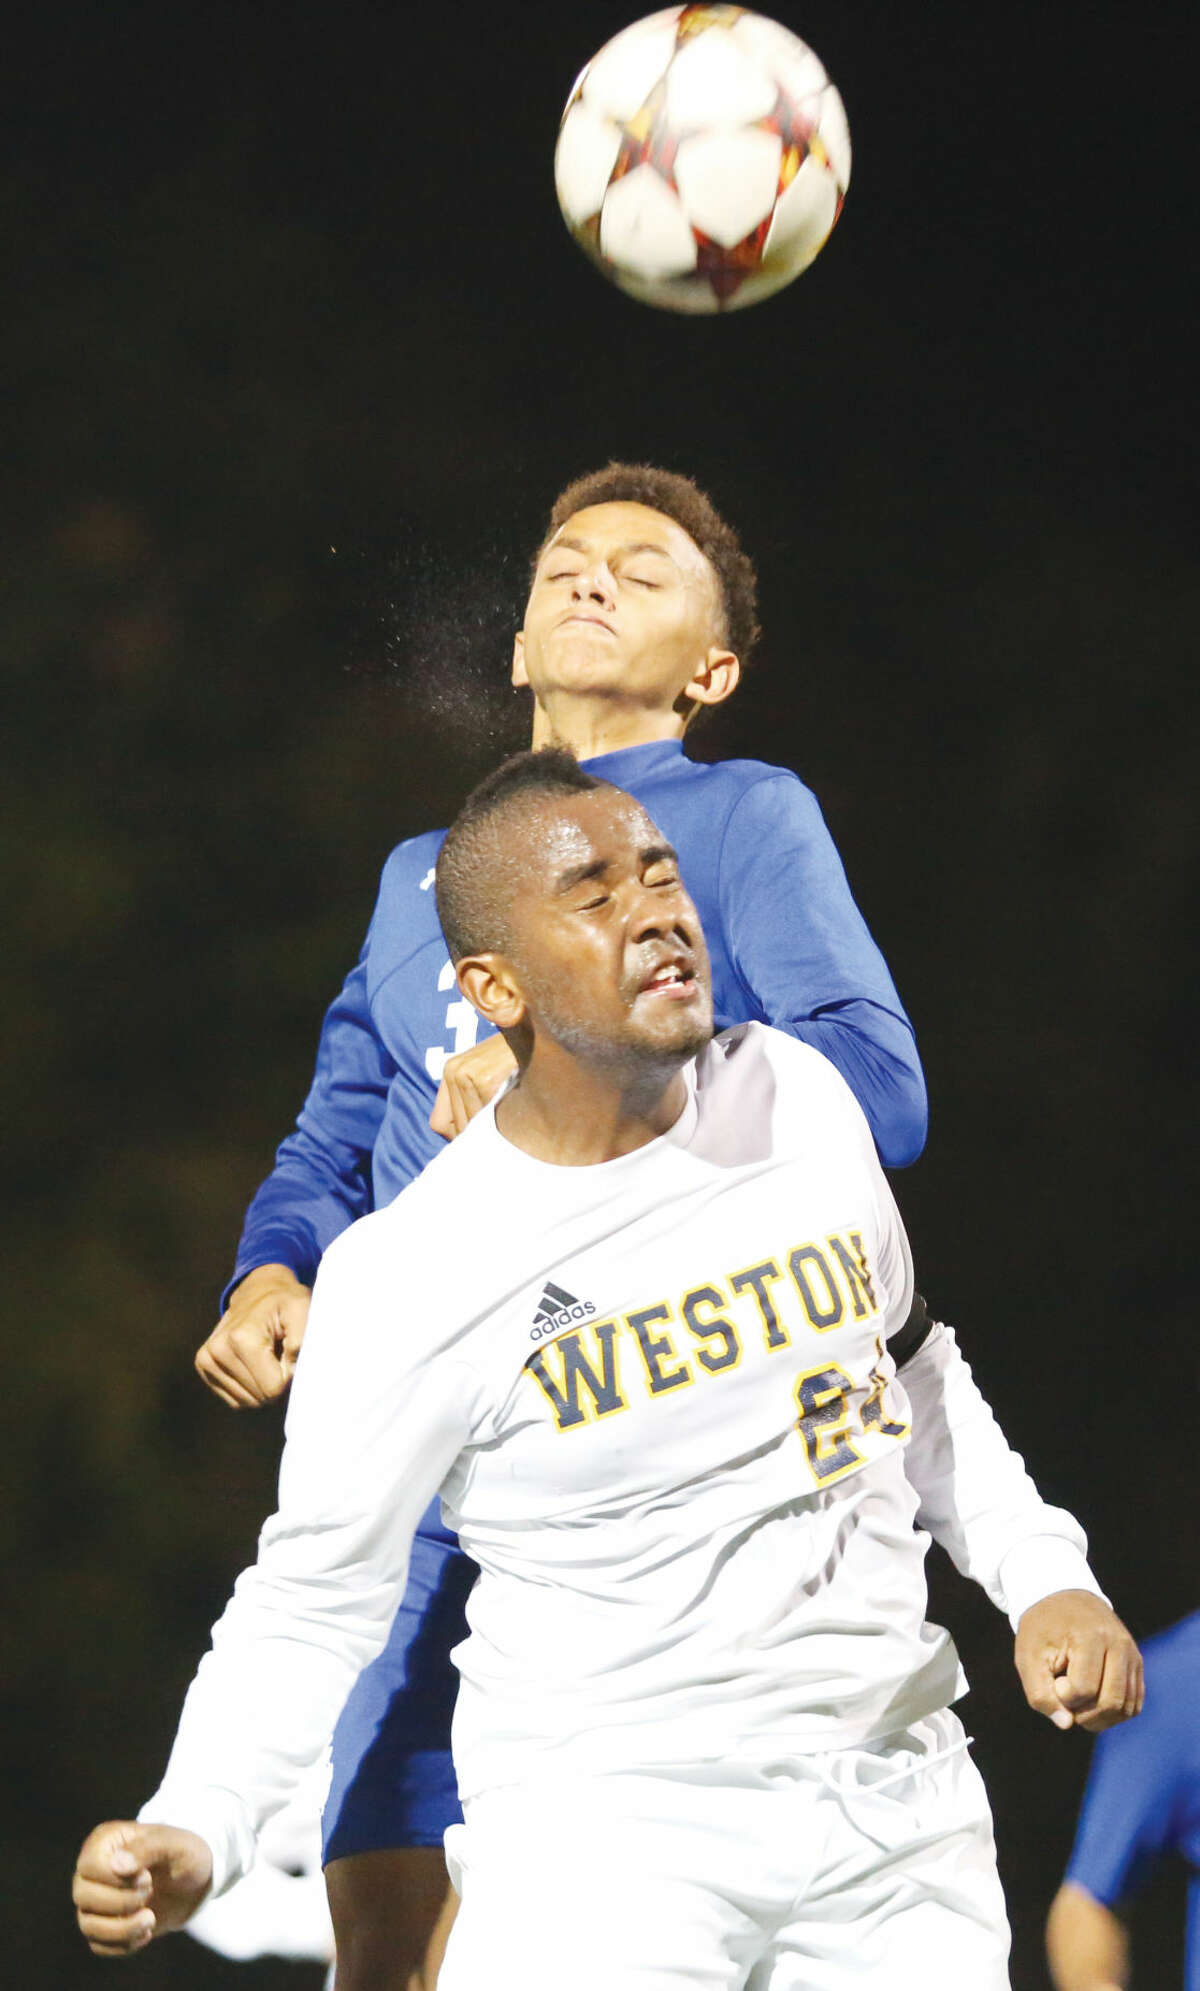 Hour photo/Chris Palermo Weston's Sam Chicha jumps for a header against a Bunnell defenseman Tuesday night.